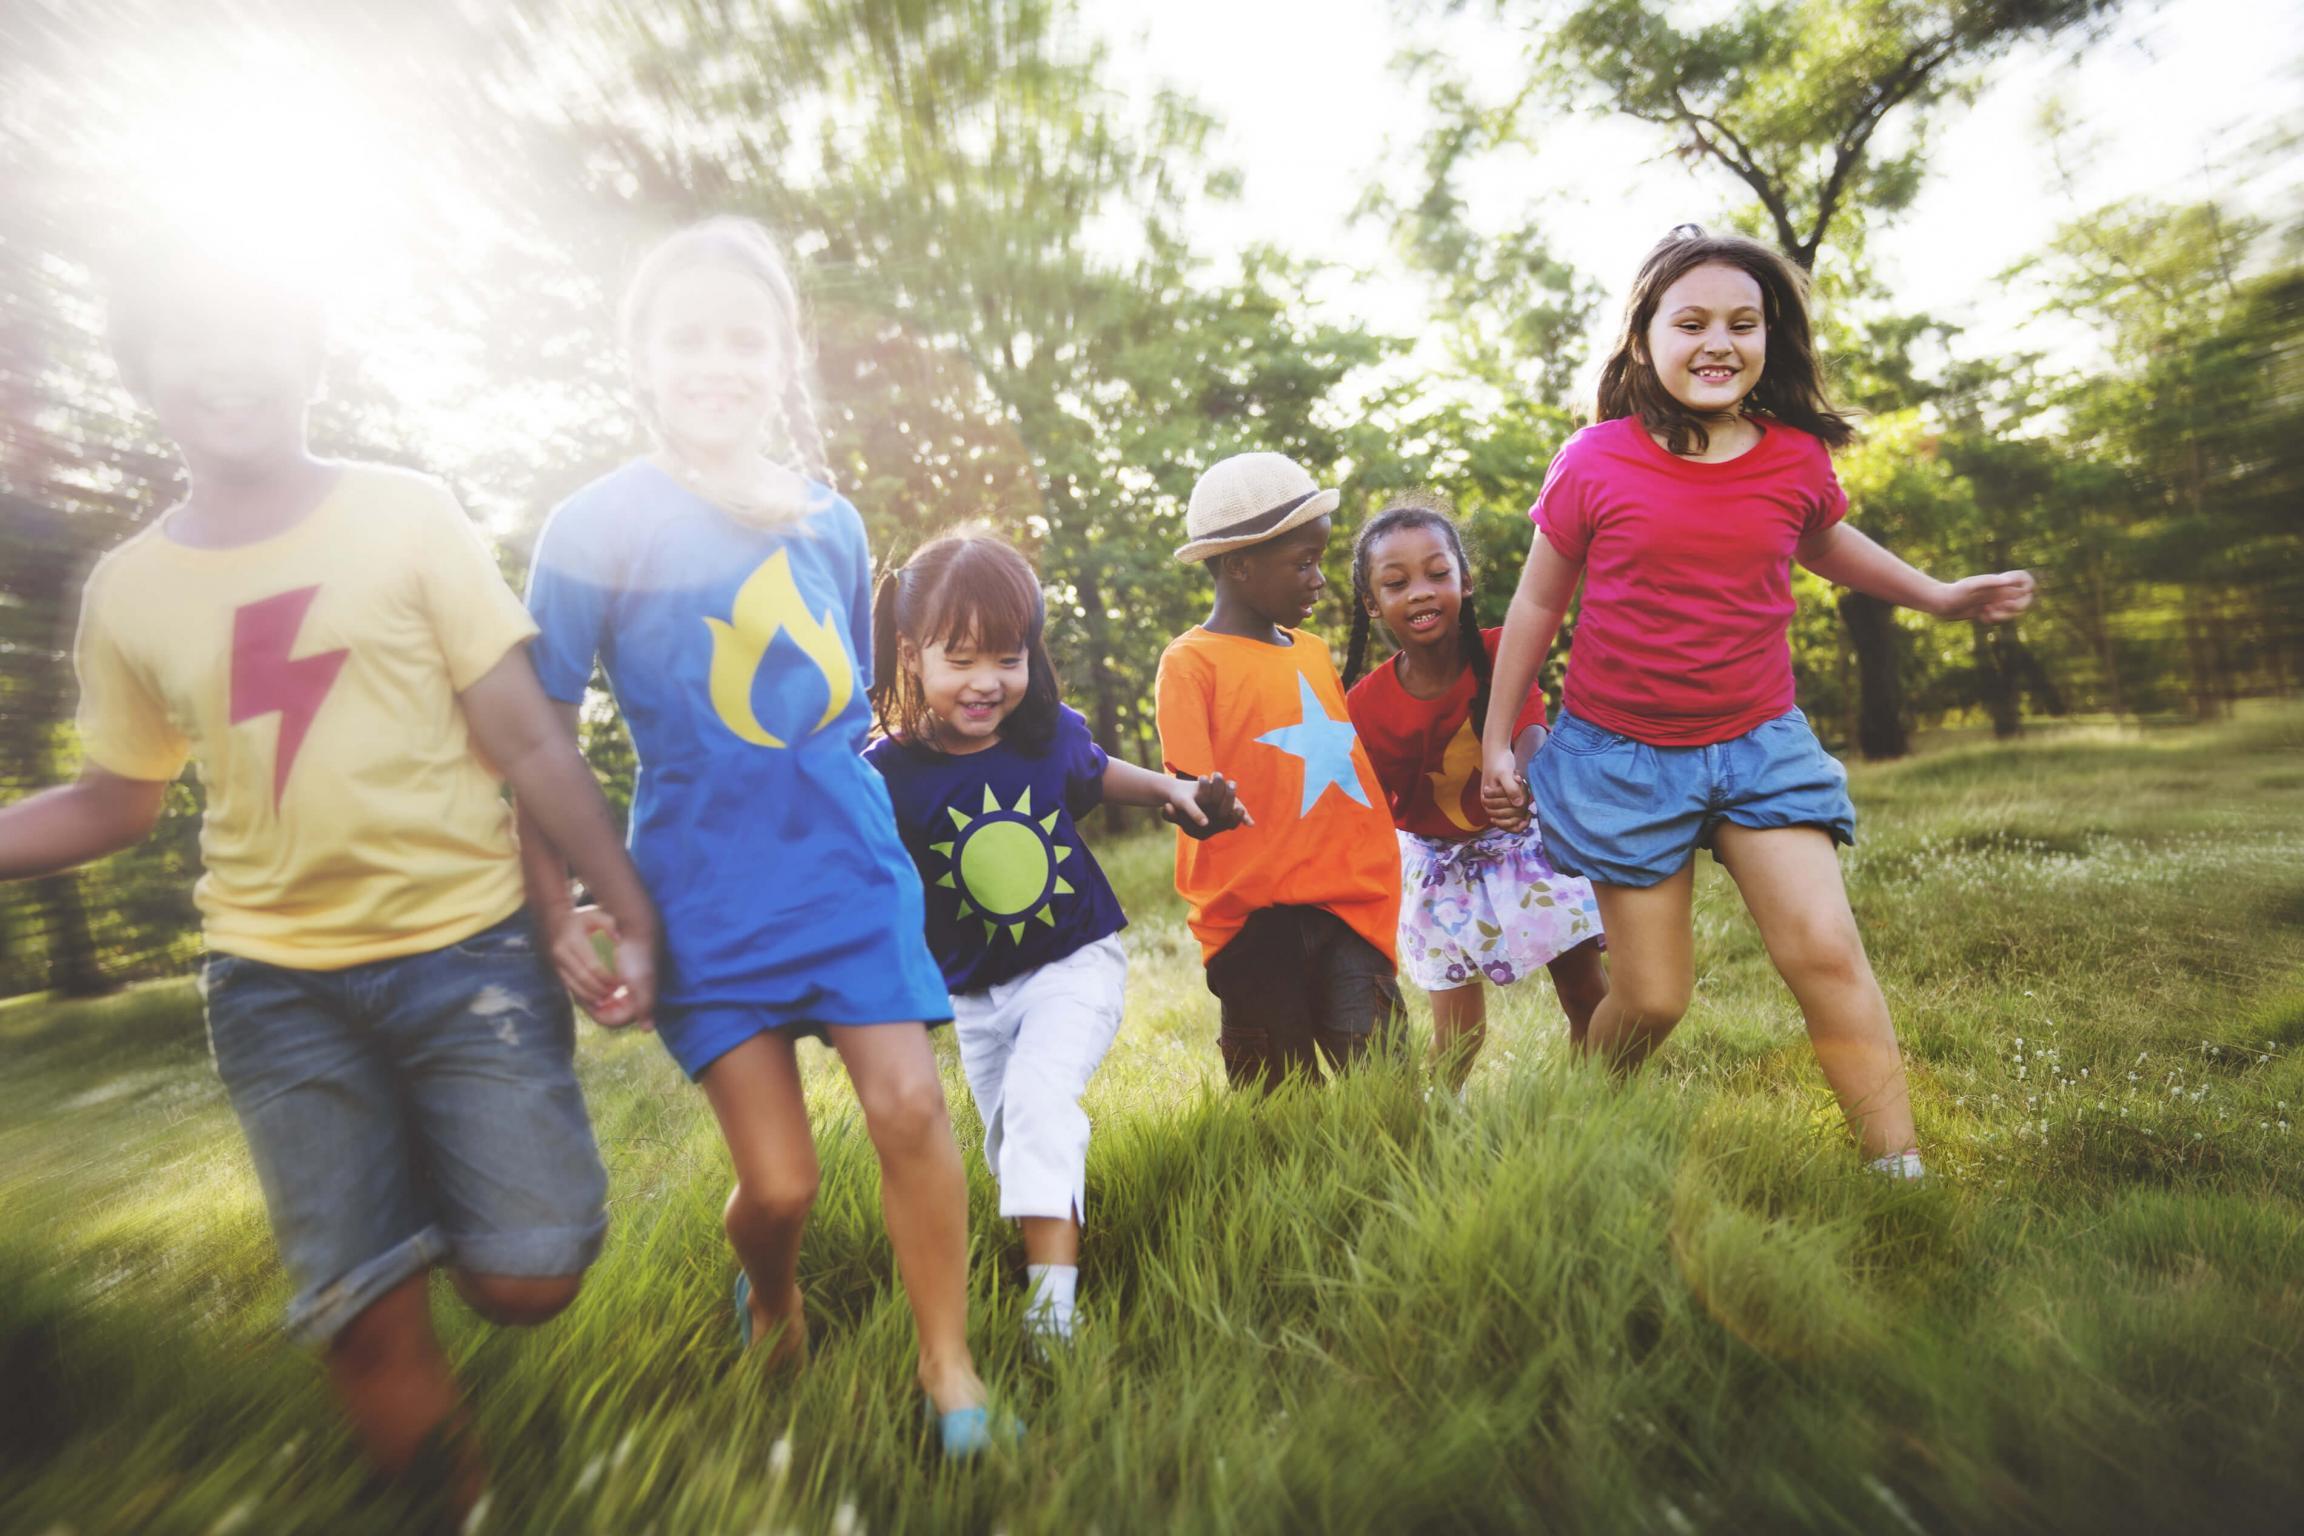 stock-photo-child-children-childhood-fun-playful-activity-kids-concept-346570466